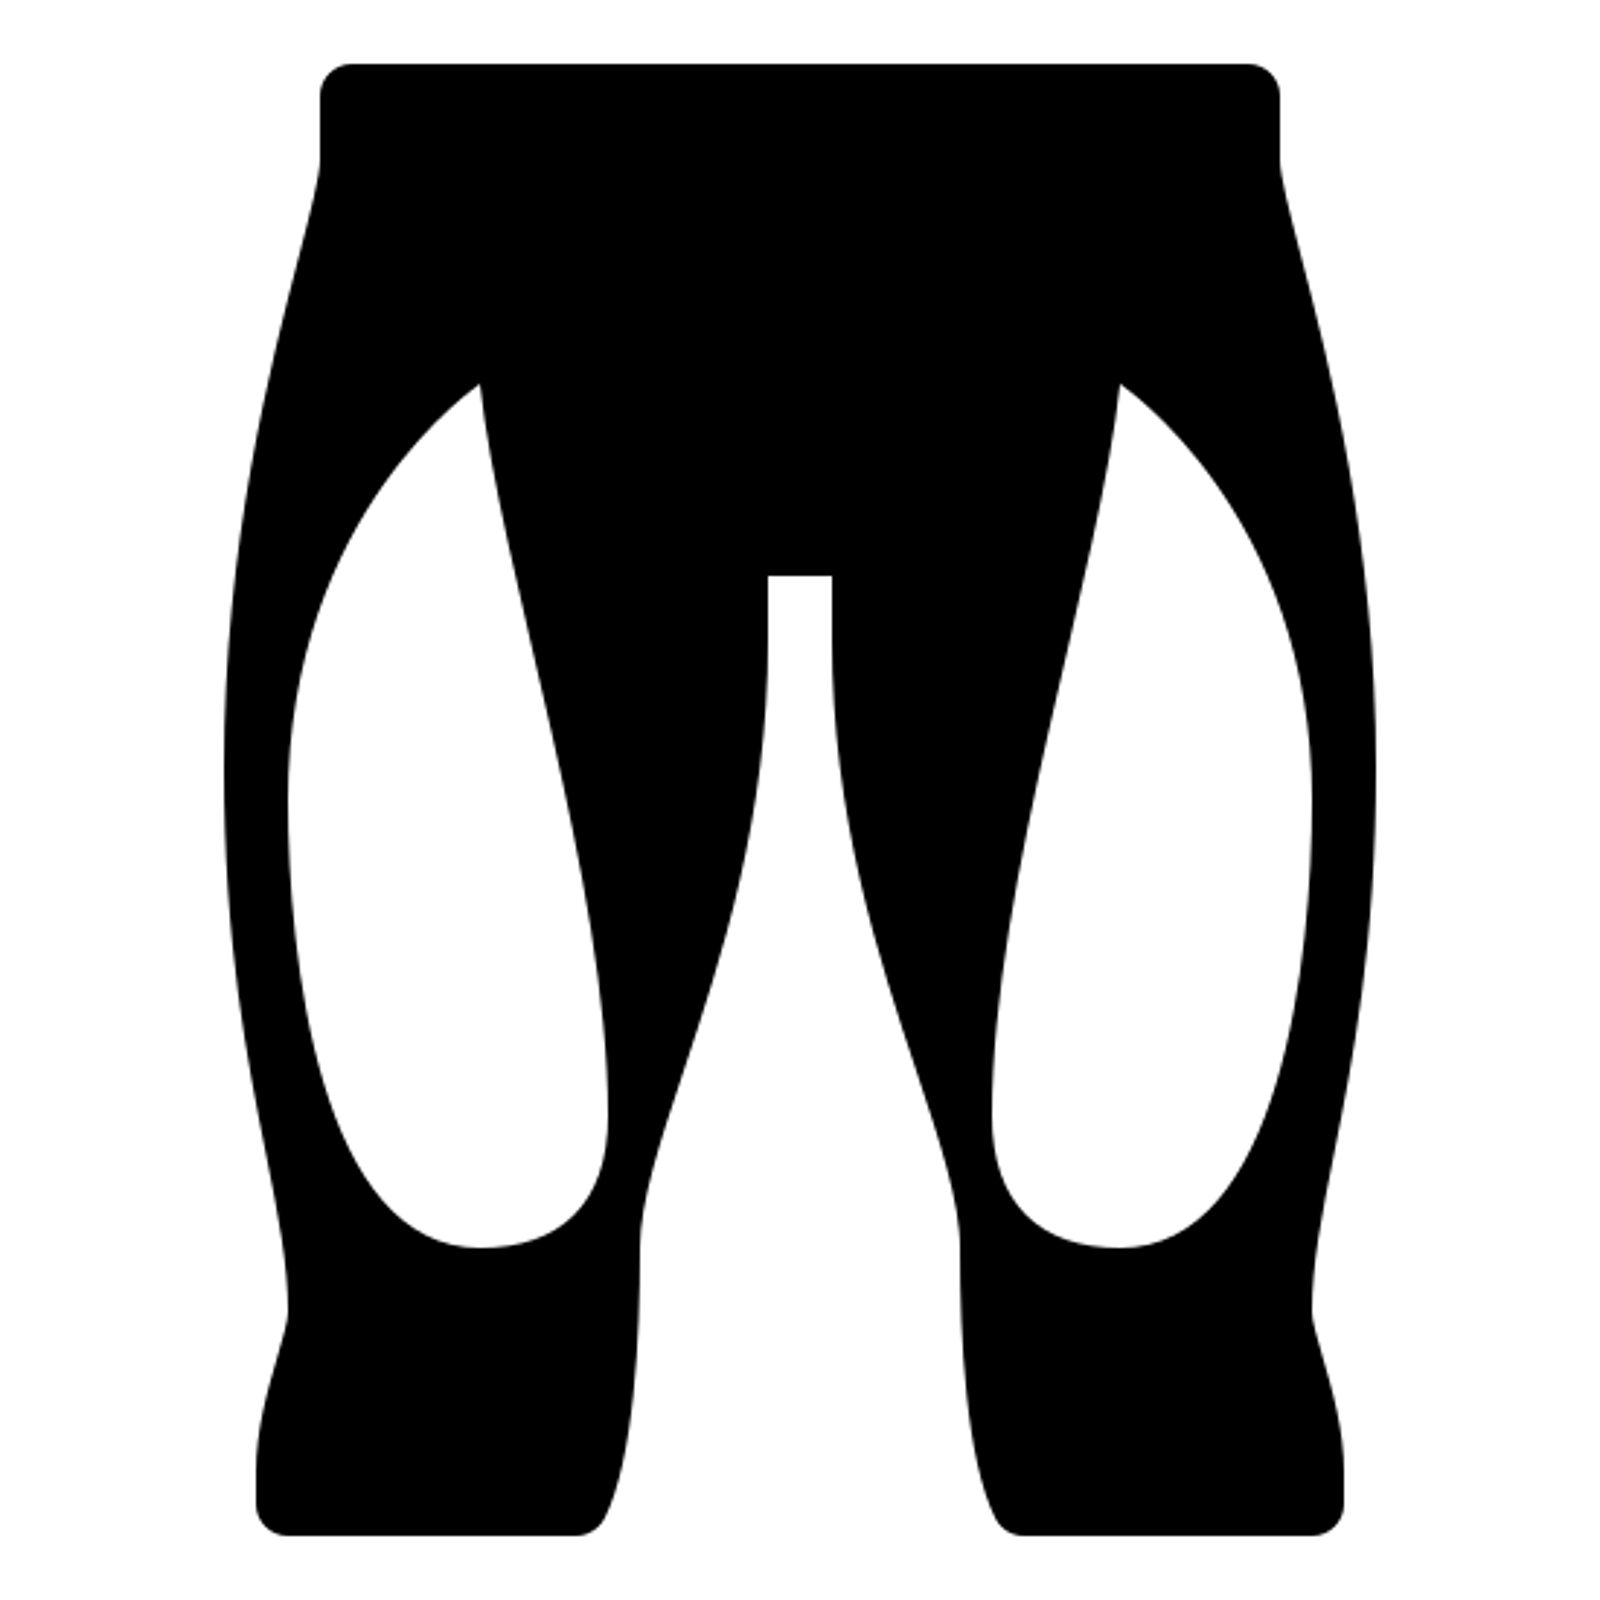 Quadriceps Filled icon